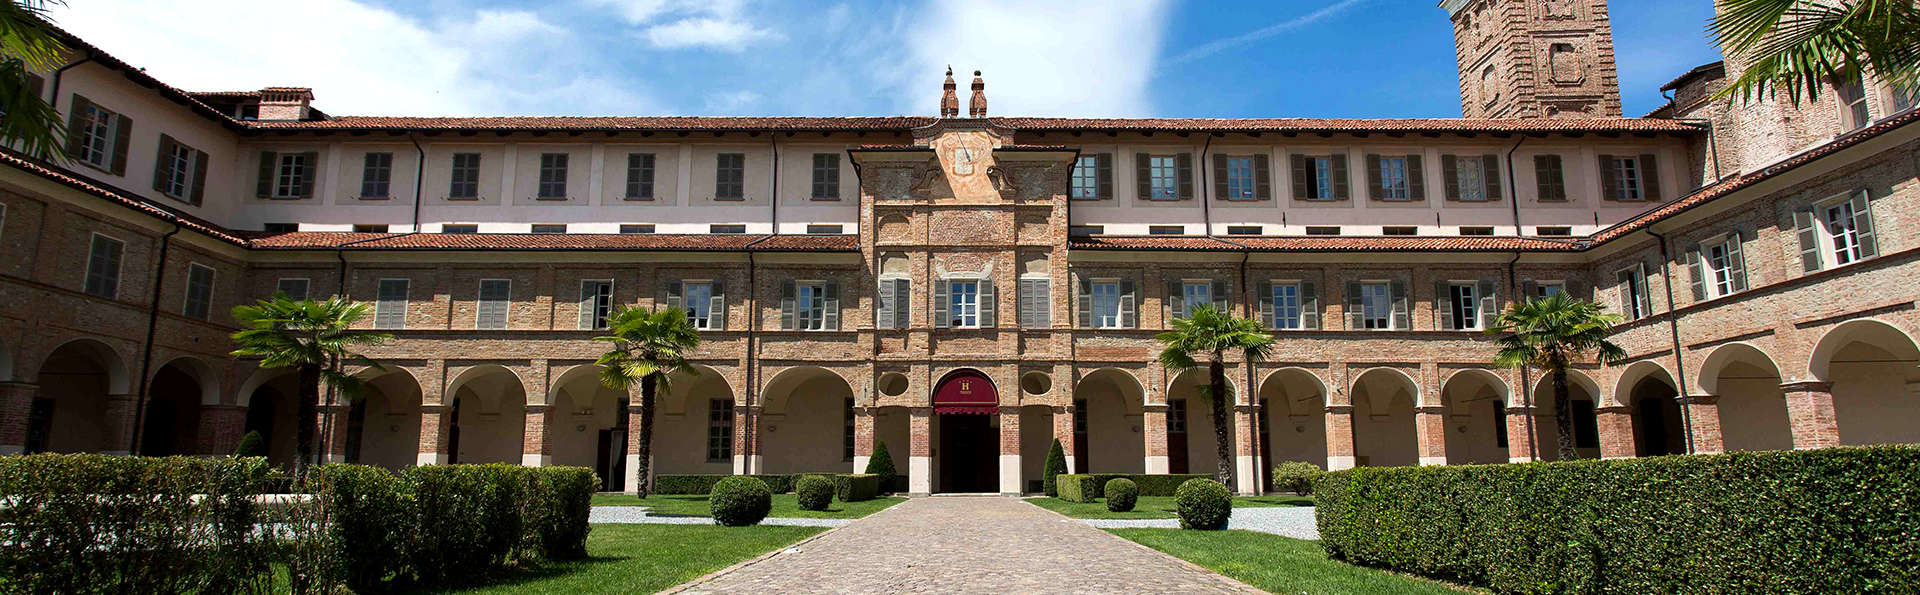 Monastero di Cherasco - Hotel i Somaschi - Edit_Front.jpg